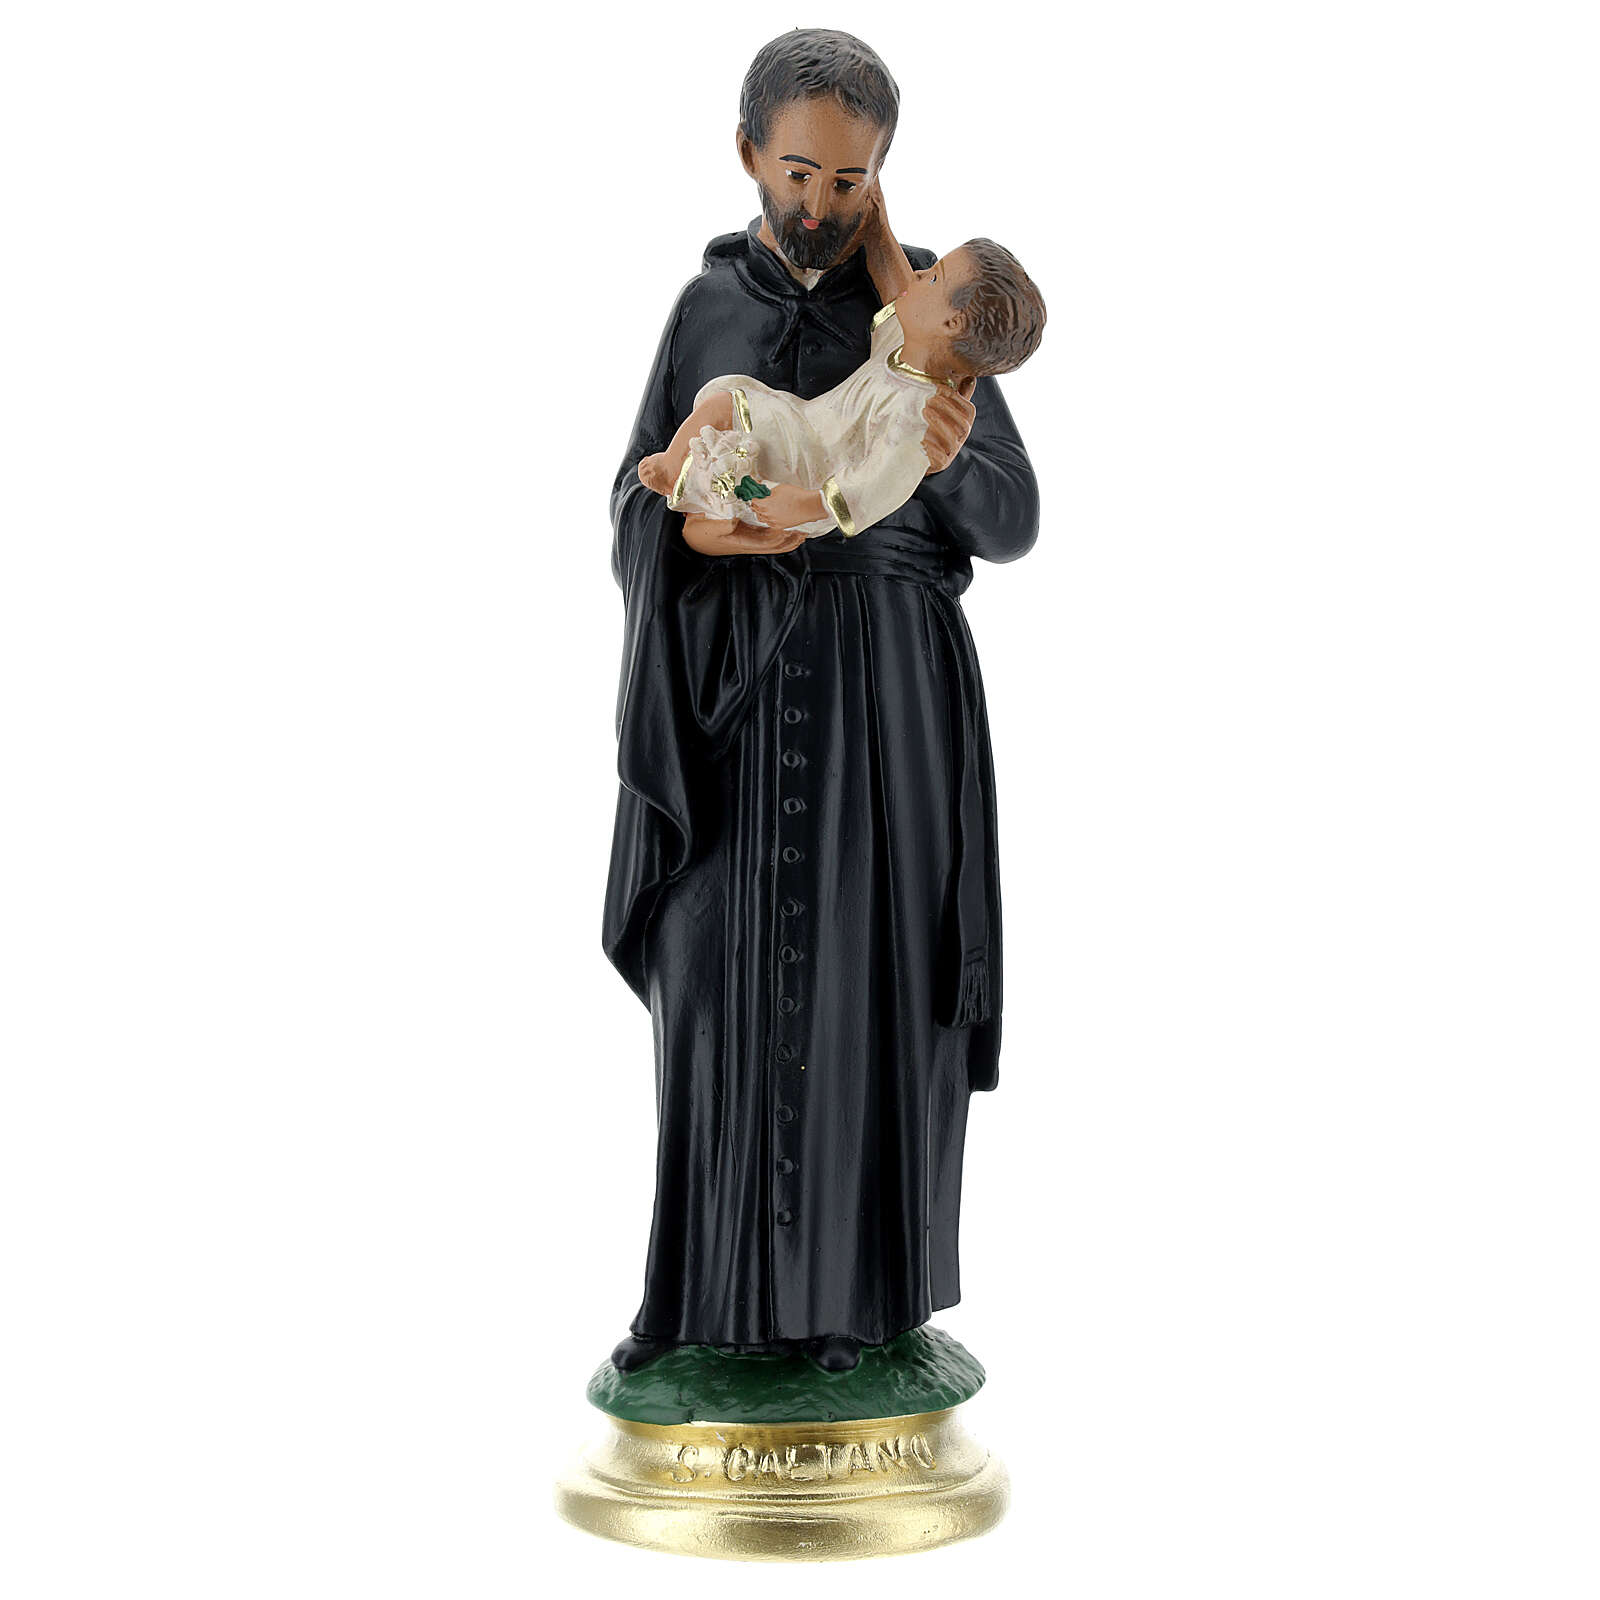 St. Gaetano statue 25 cm plaster hand painted Arte Barsanti 4